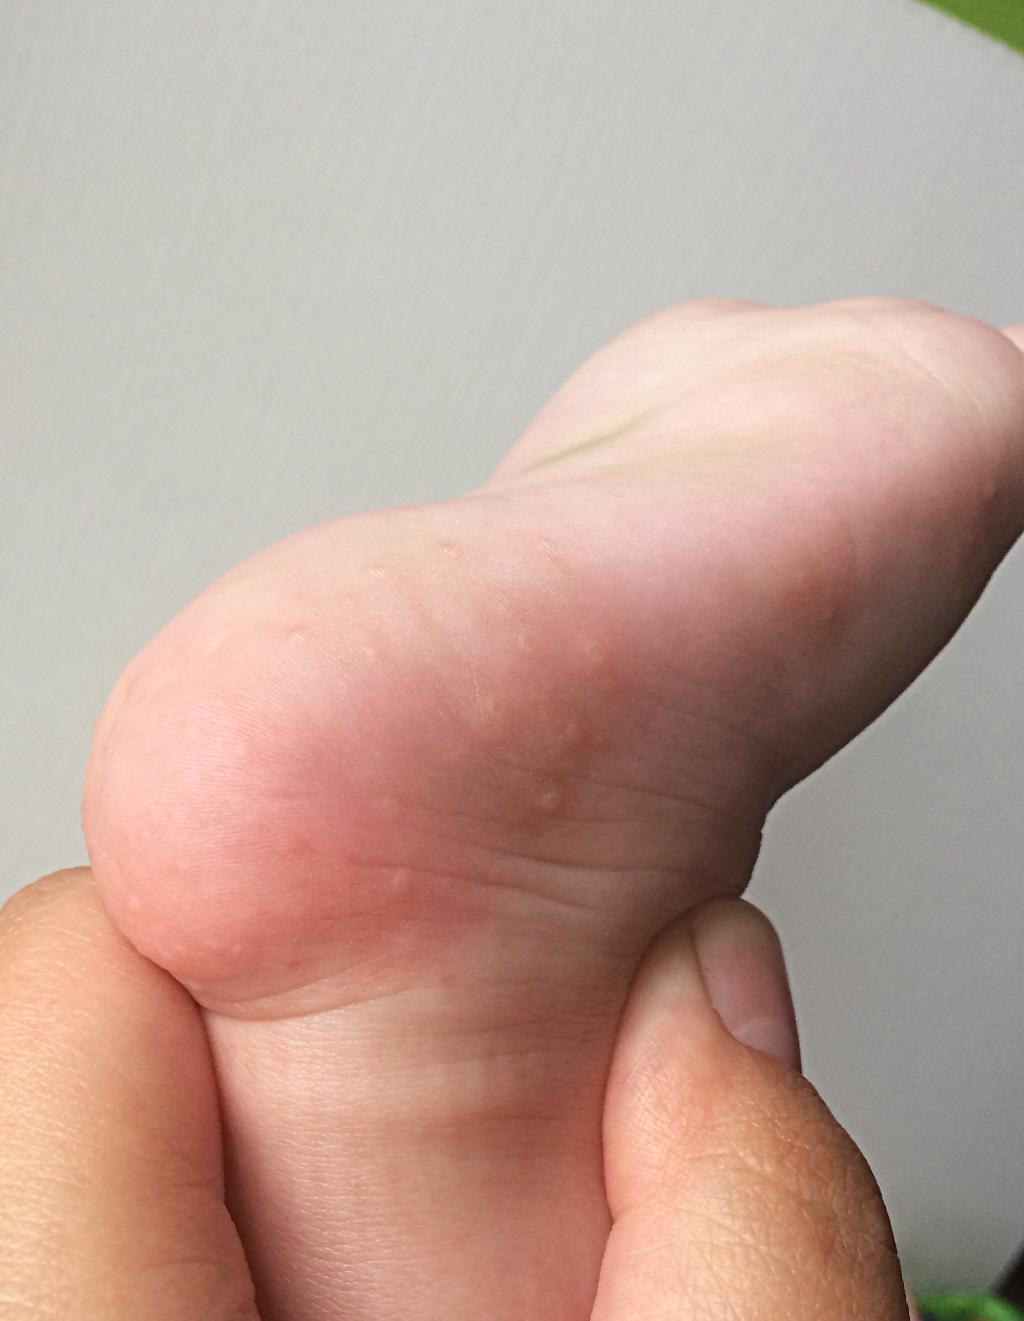 аллергия мелкие пятна